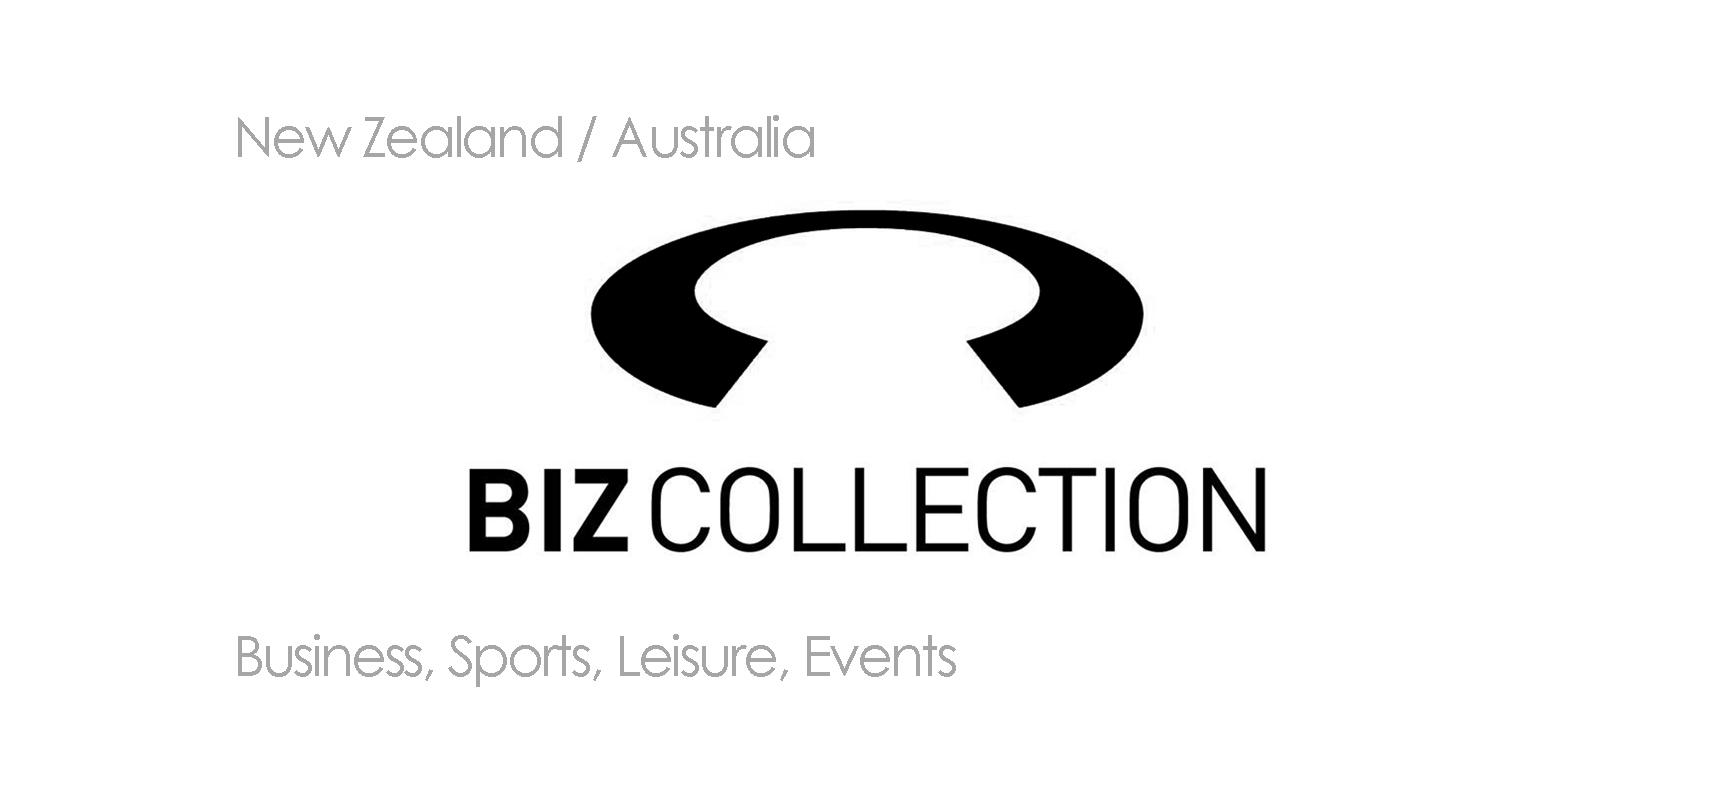 1 biz collection -1.jpg